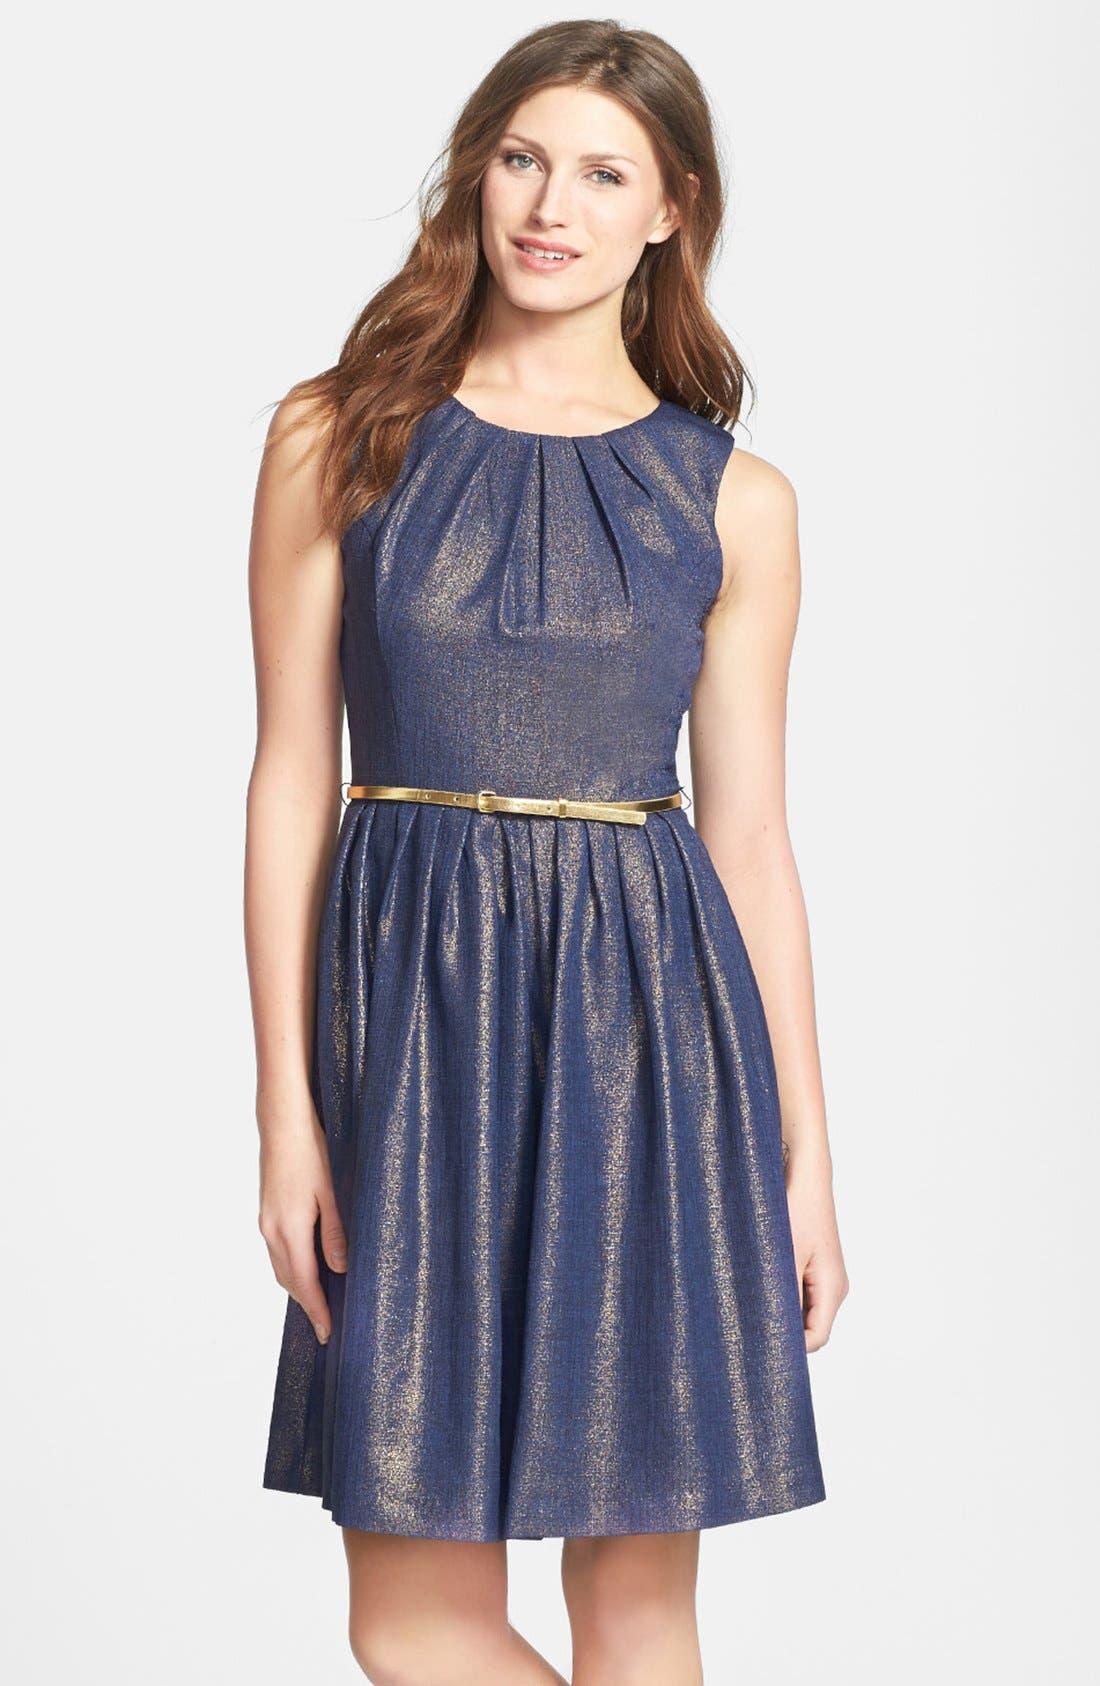 Alternate Image 1 Selected - Ellen Tracy Metallic Sleeveless Dress (Regular & Petite)